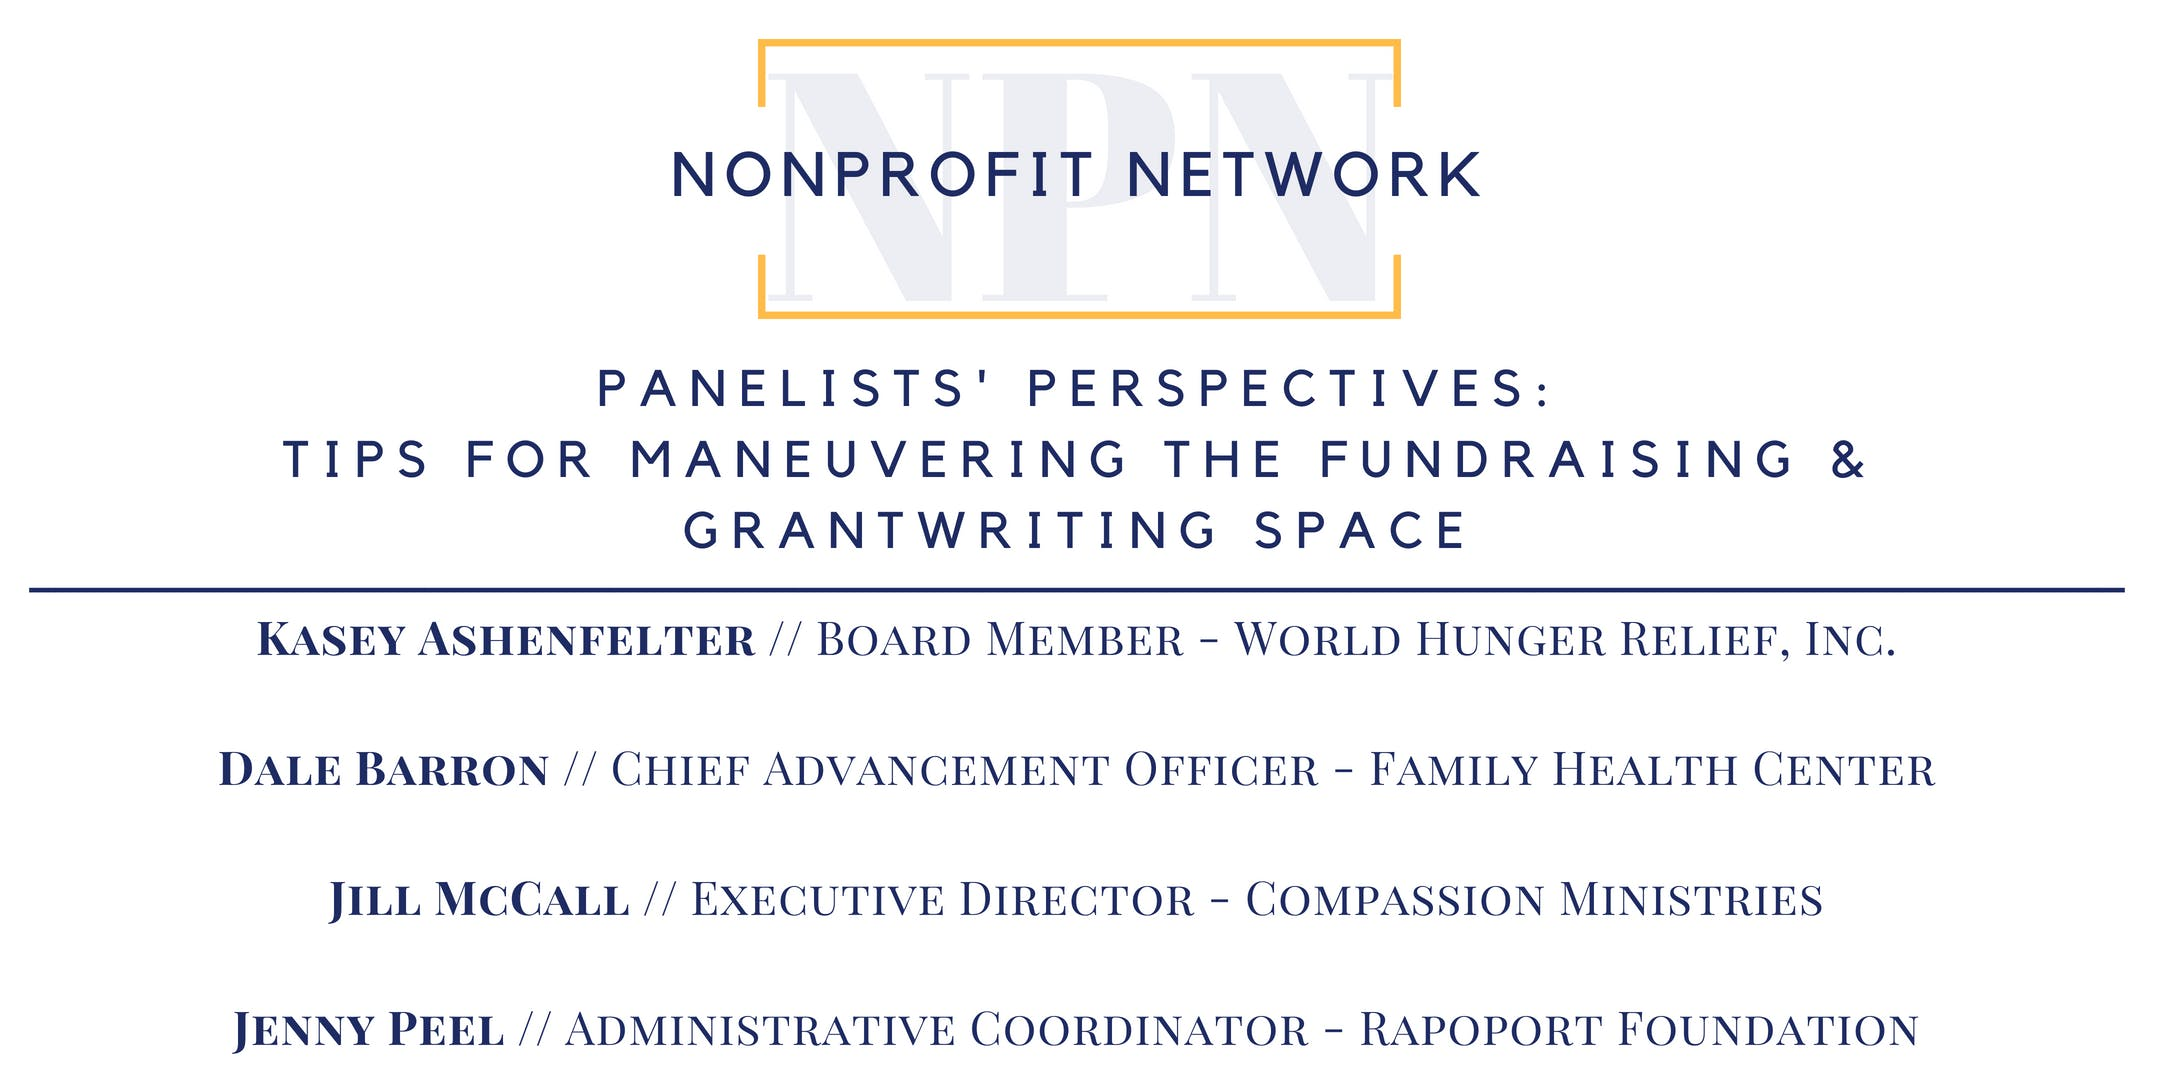 Texas Life Annex : Nonprofit Network - Panelists